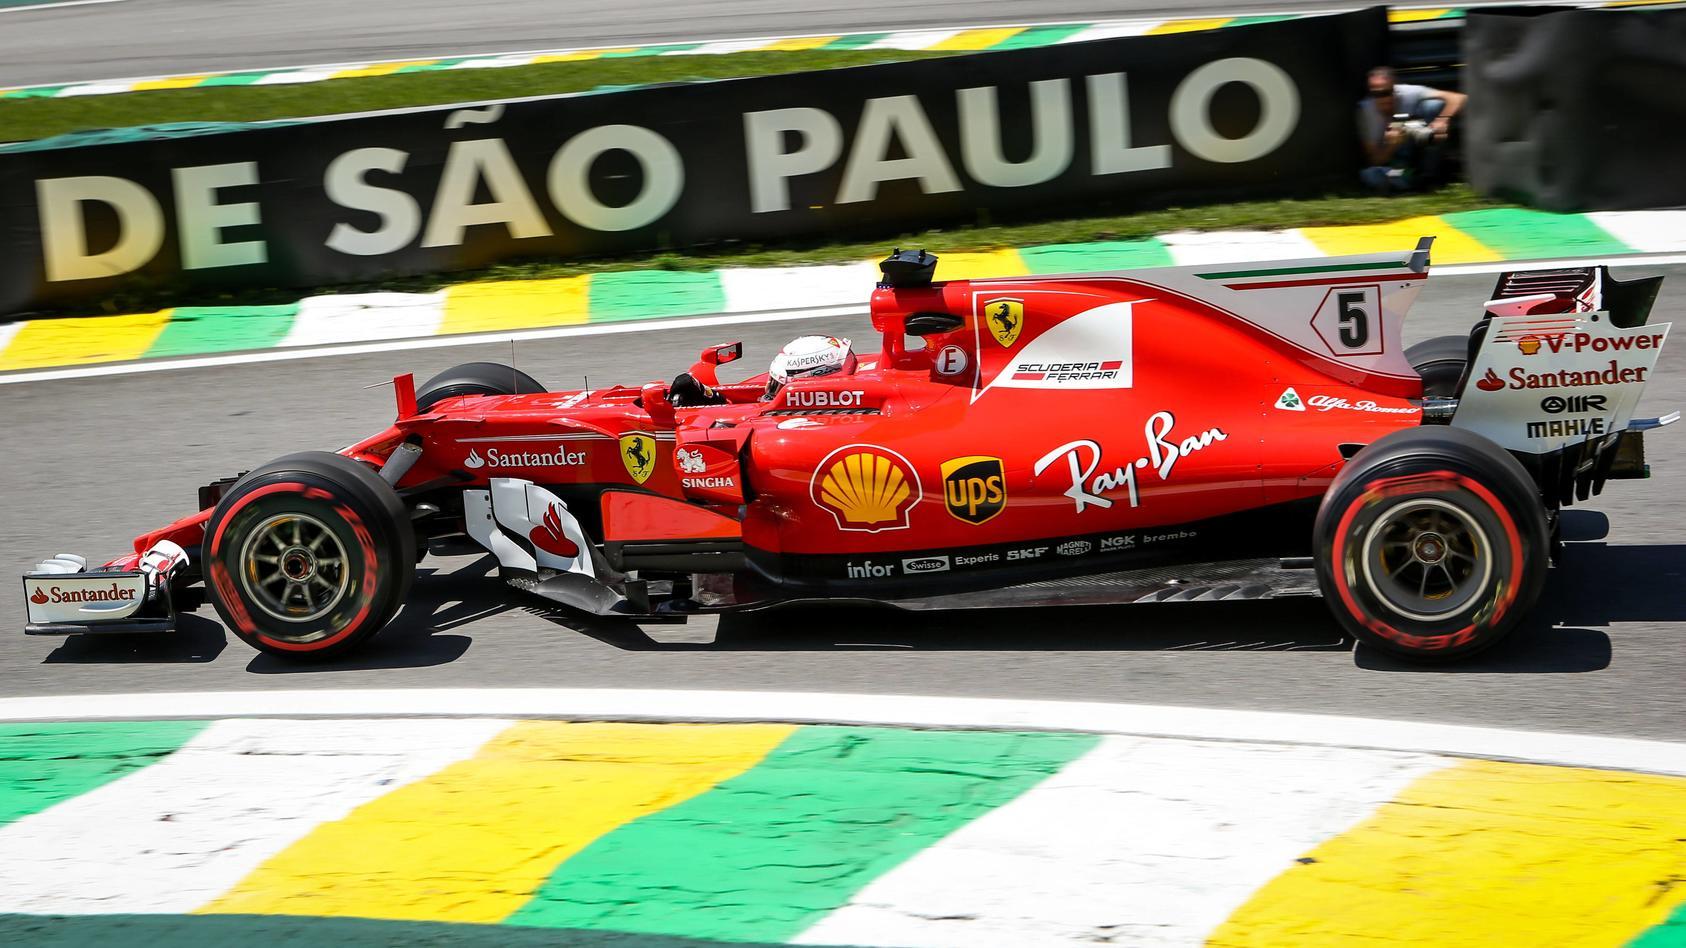 Motorsports FIA Formula One World Championship WM Weltmeisterschaft 2017 Grand Prix of Brazil 5 S